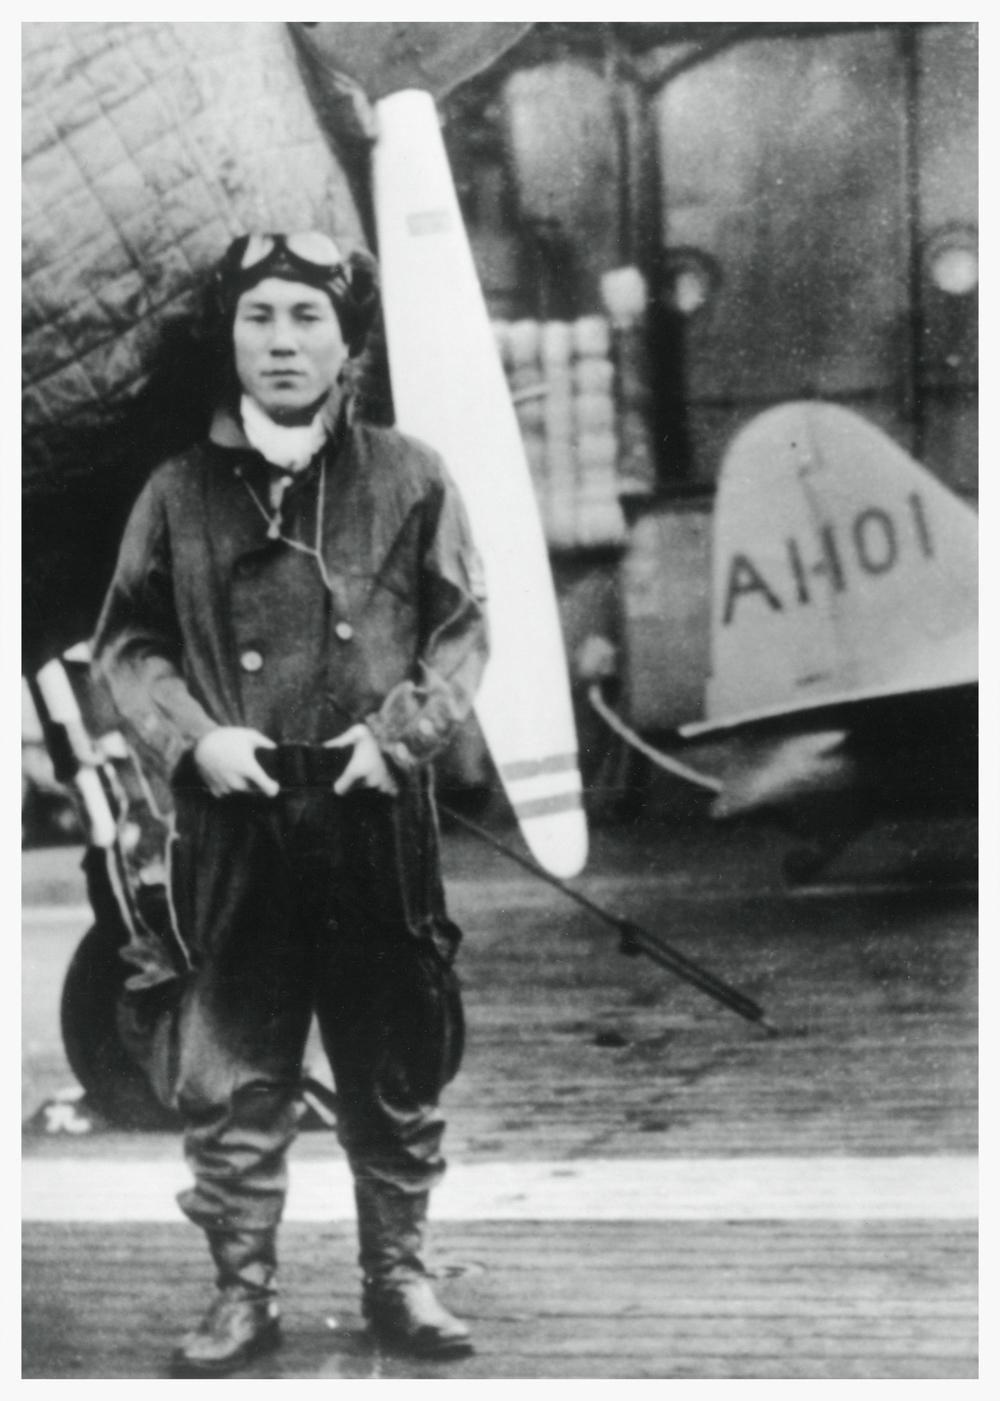 Zenji Abe on the aircraft carrier, Akagi, 1941.